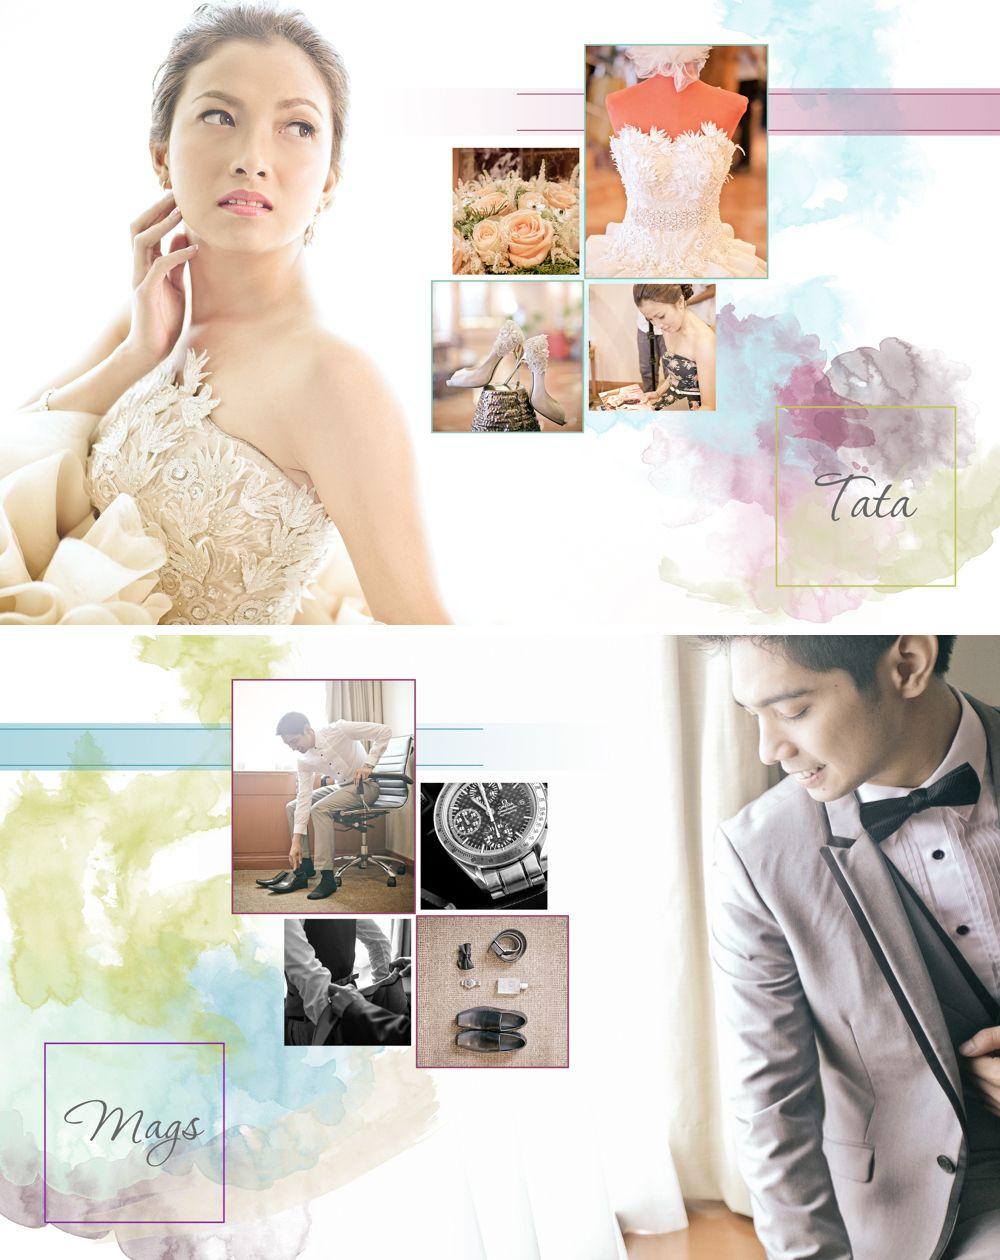 8x10 Wedding Album Layout #JustMarried #MagsAndTata